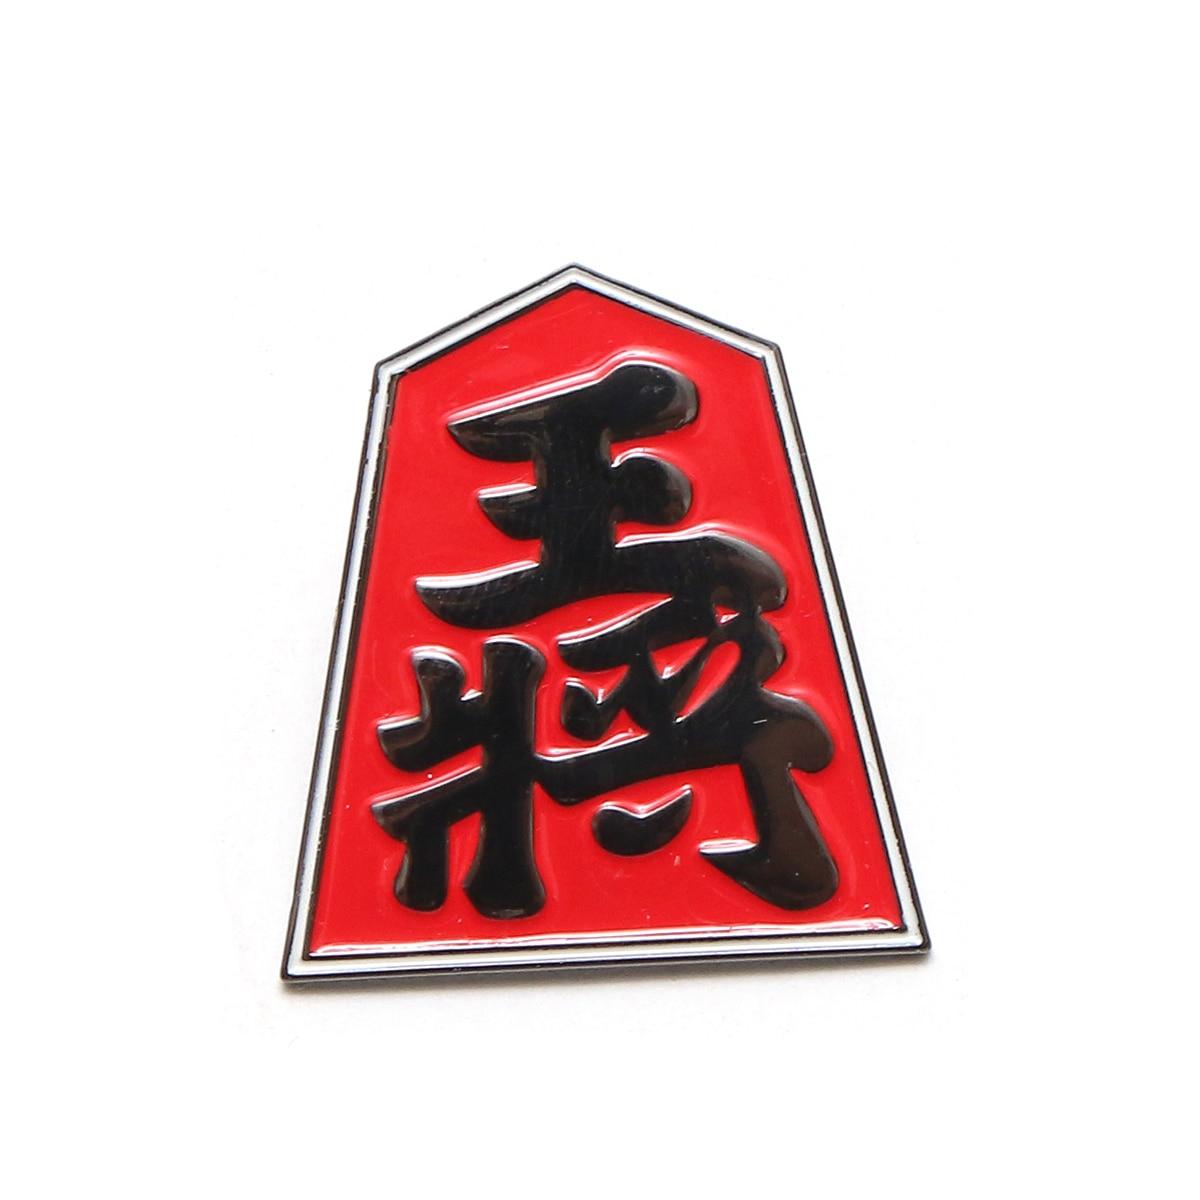 UBIQ IREZUMI PINS THREE TIDES TATTOO(SYOGI Designed by HORIHIRO MITOMO)(ユービック ピンズ スリータイズタトゥー)【ピンバッチ】【17FW-I】